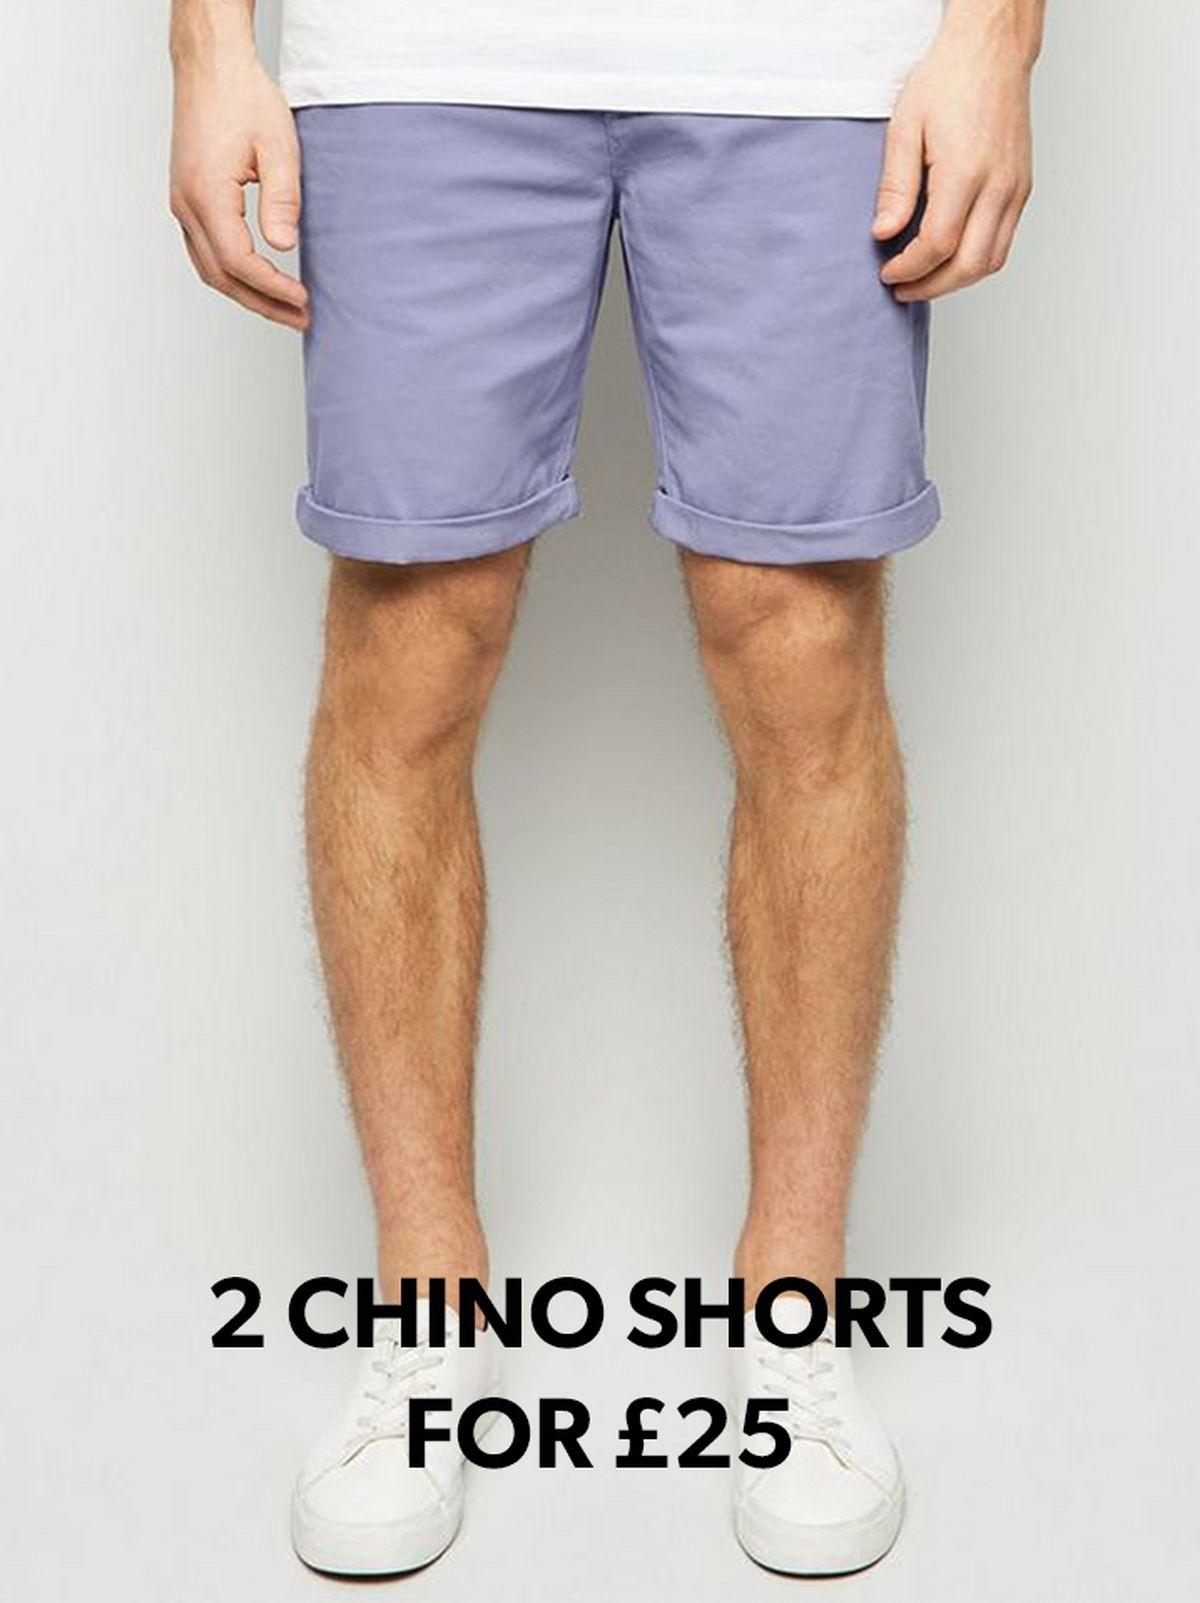 Men's Clothing | Men's Fashion & Clothes Online | New Look